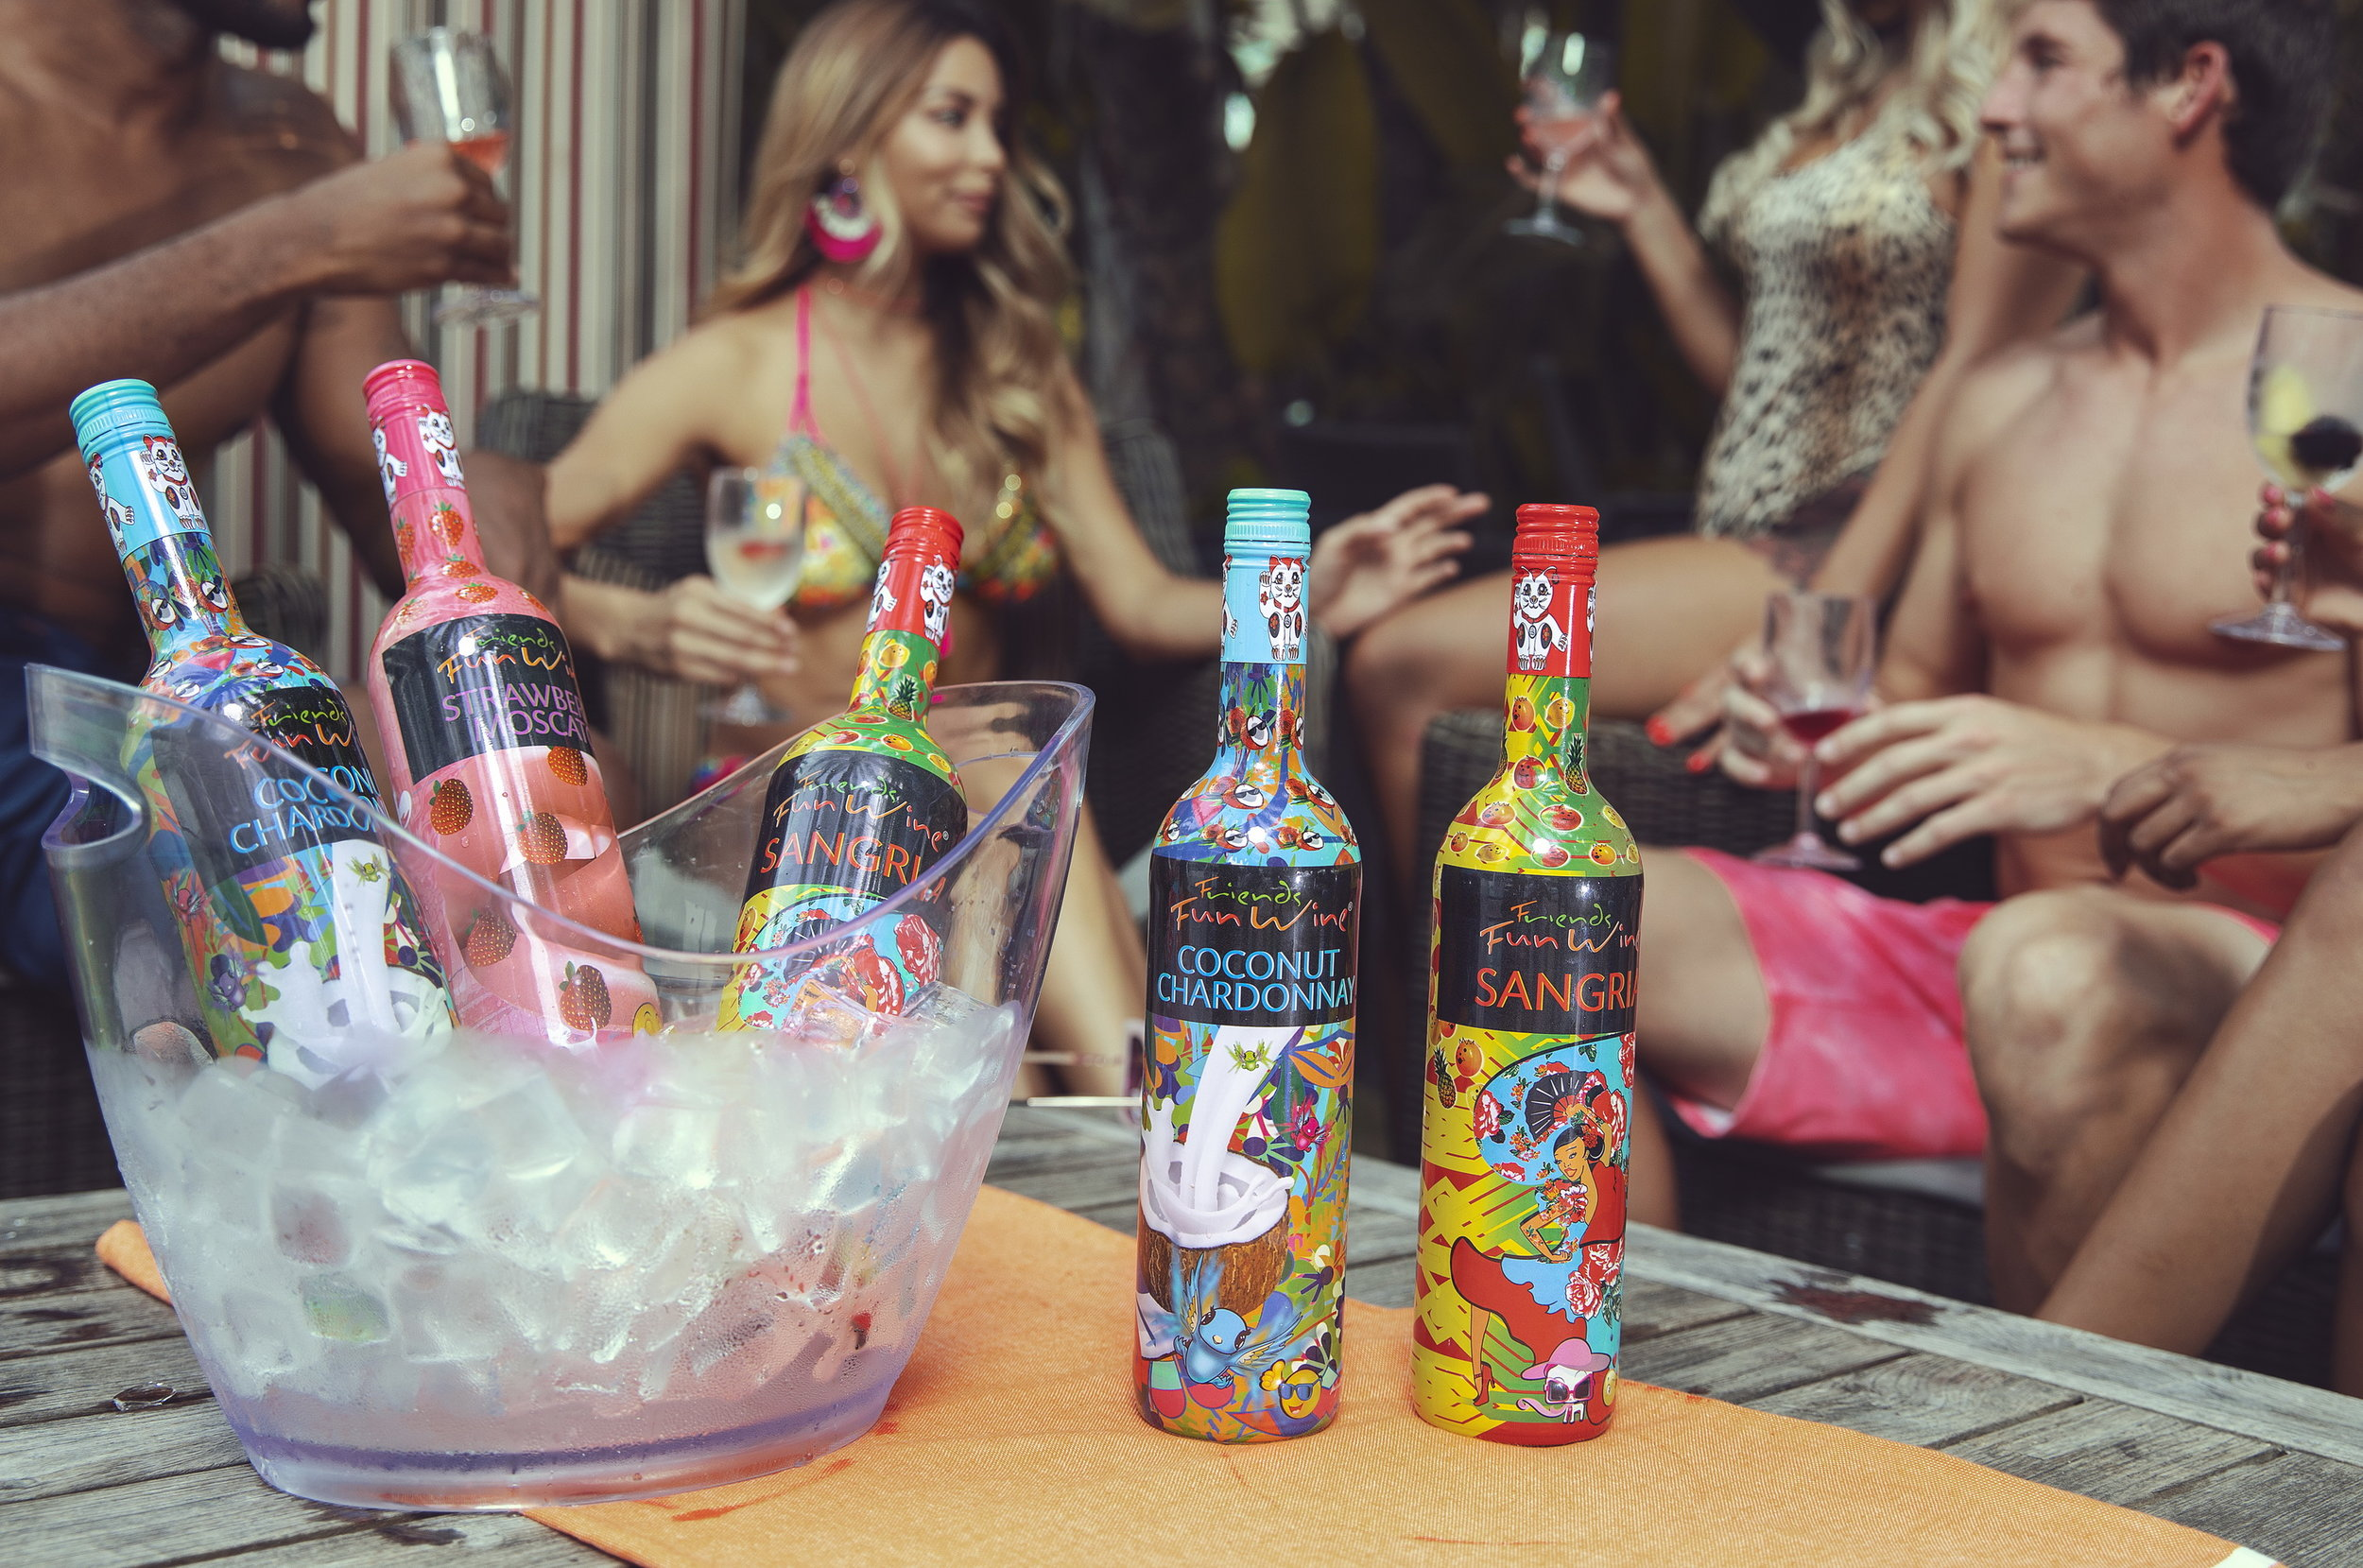 Friends Fun Wine - Social Media Ad